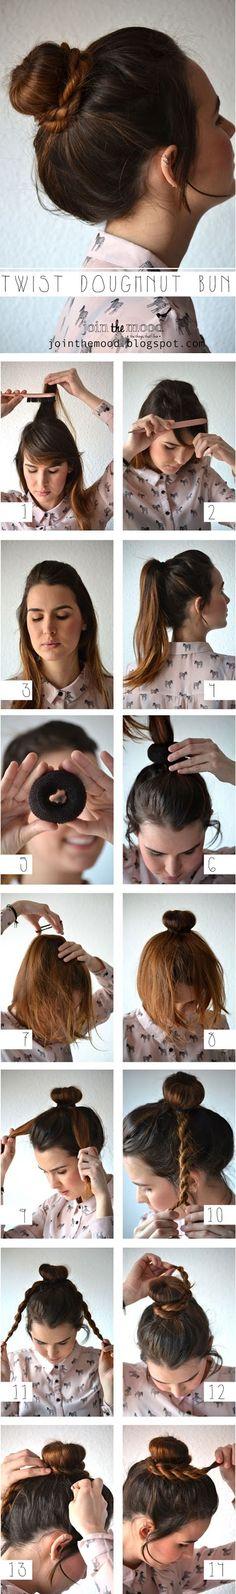 How To Make Twist Doughnut Bun For Your Hair - Hair Tutorials Step By Step Hairstyles, Braided Hairstyles Tutorials, Pretty Hairstyles, Easy Hairstyles, Hair Tutorials, Hairstyle Ideas, Wedding Hairstyles, Updo Hairstyle, Everyday Hairstyles